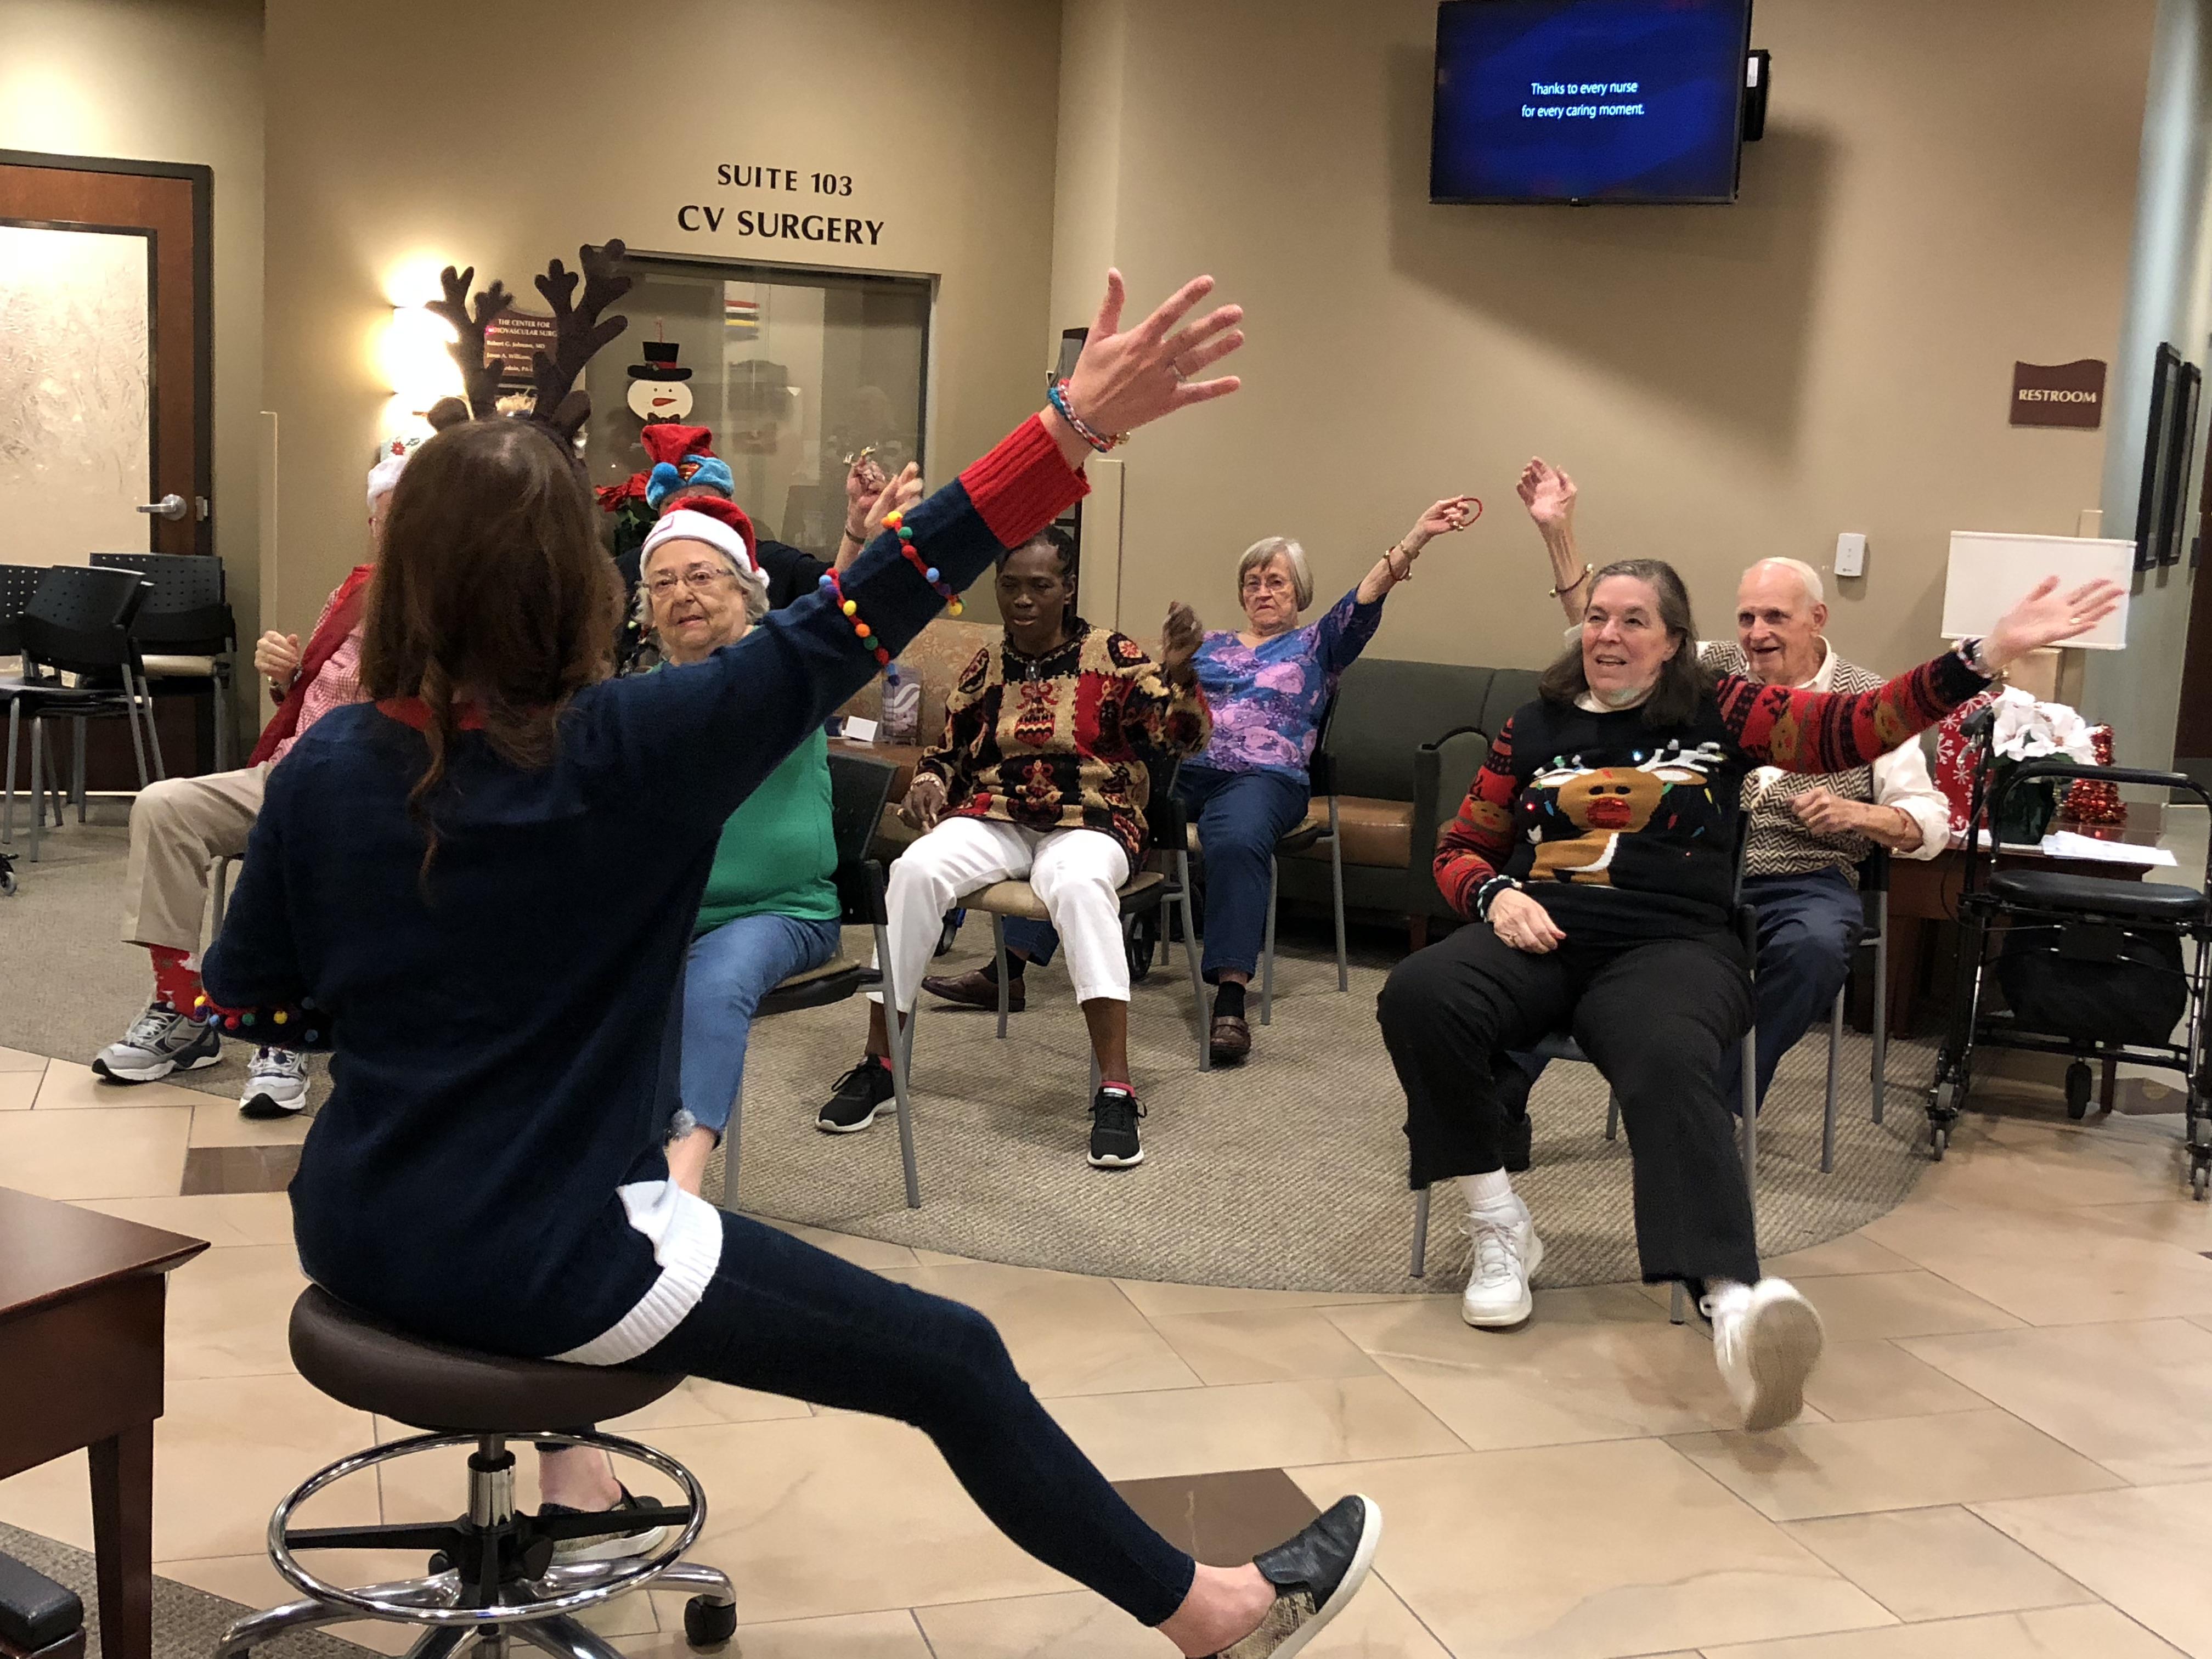 Ocean Springs Neurological Vestibular Rehab & Encore Rehabilitation held their Annual Support Group Christmas Party #EncoreRehab